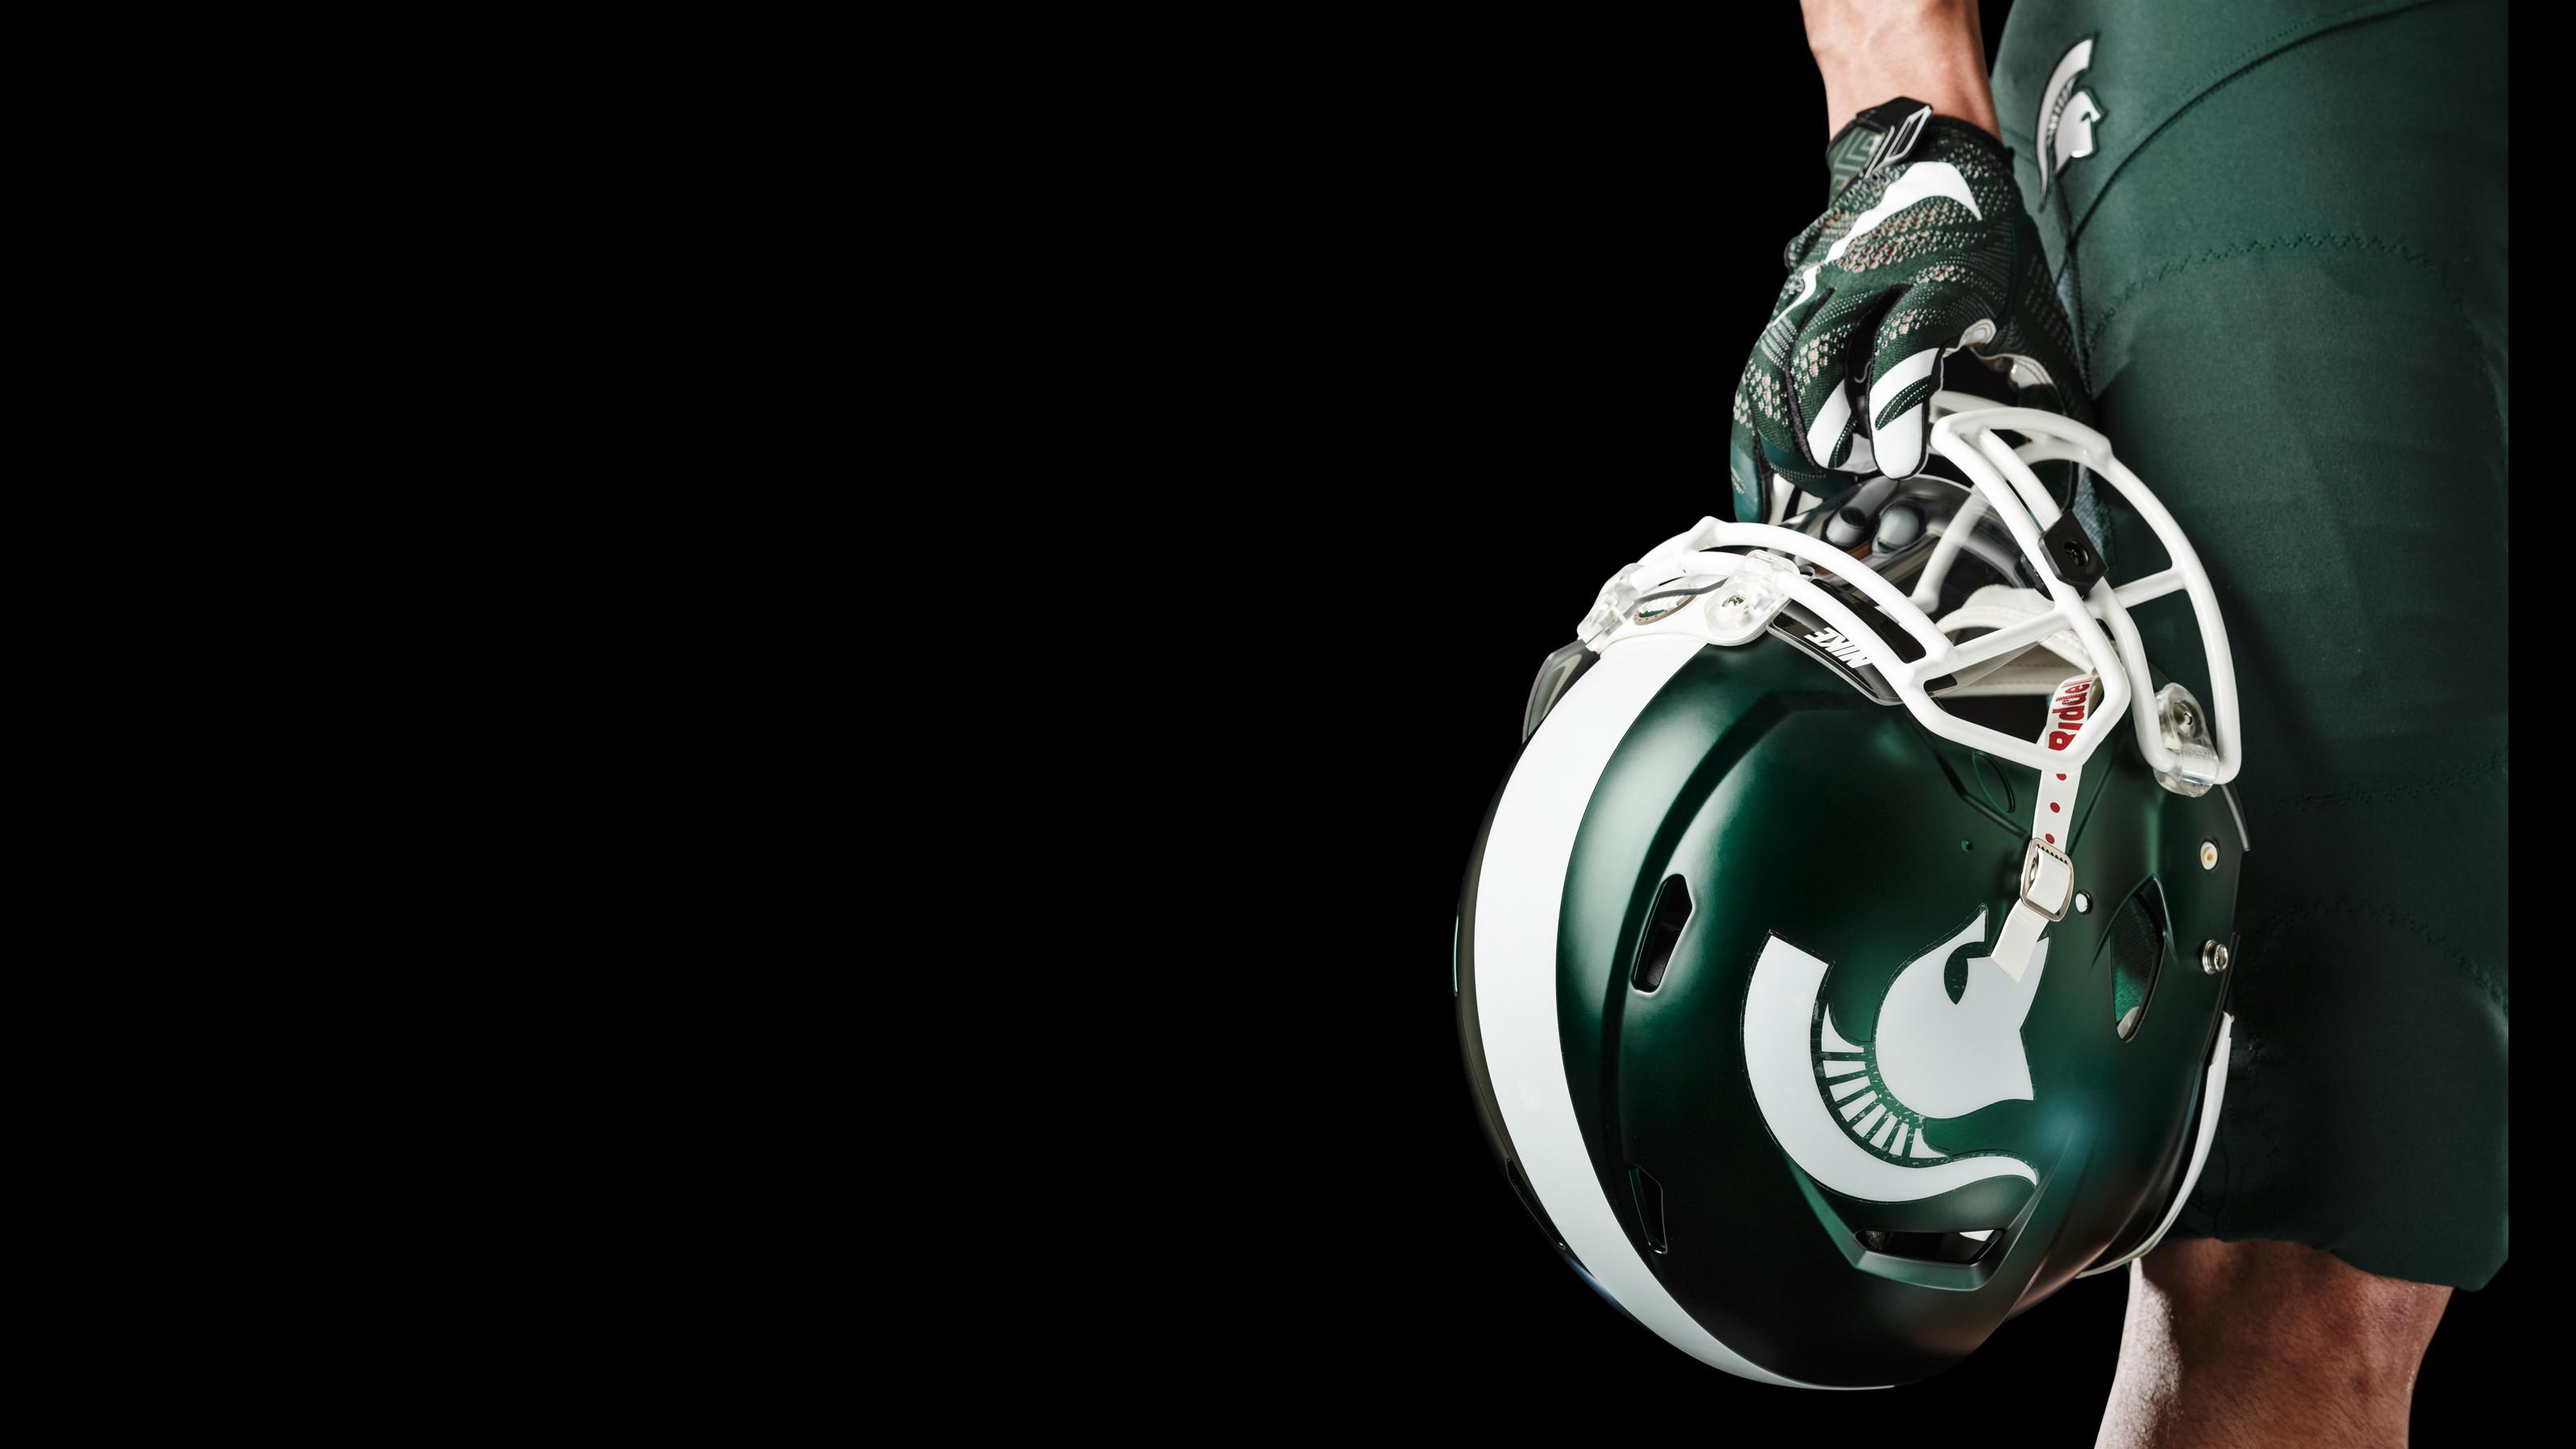 Michigan State Football Updates Nike Uniform Design. Download Image: LO · HI